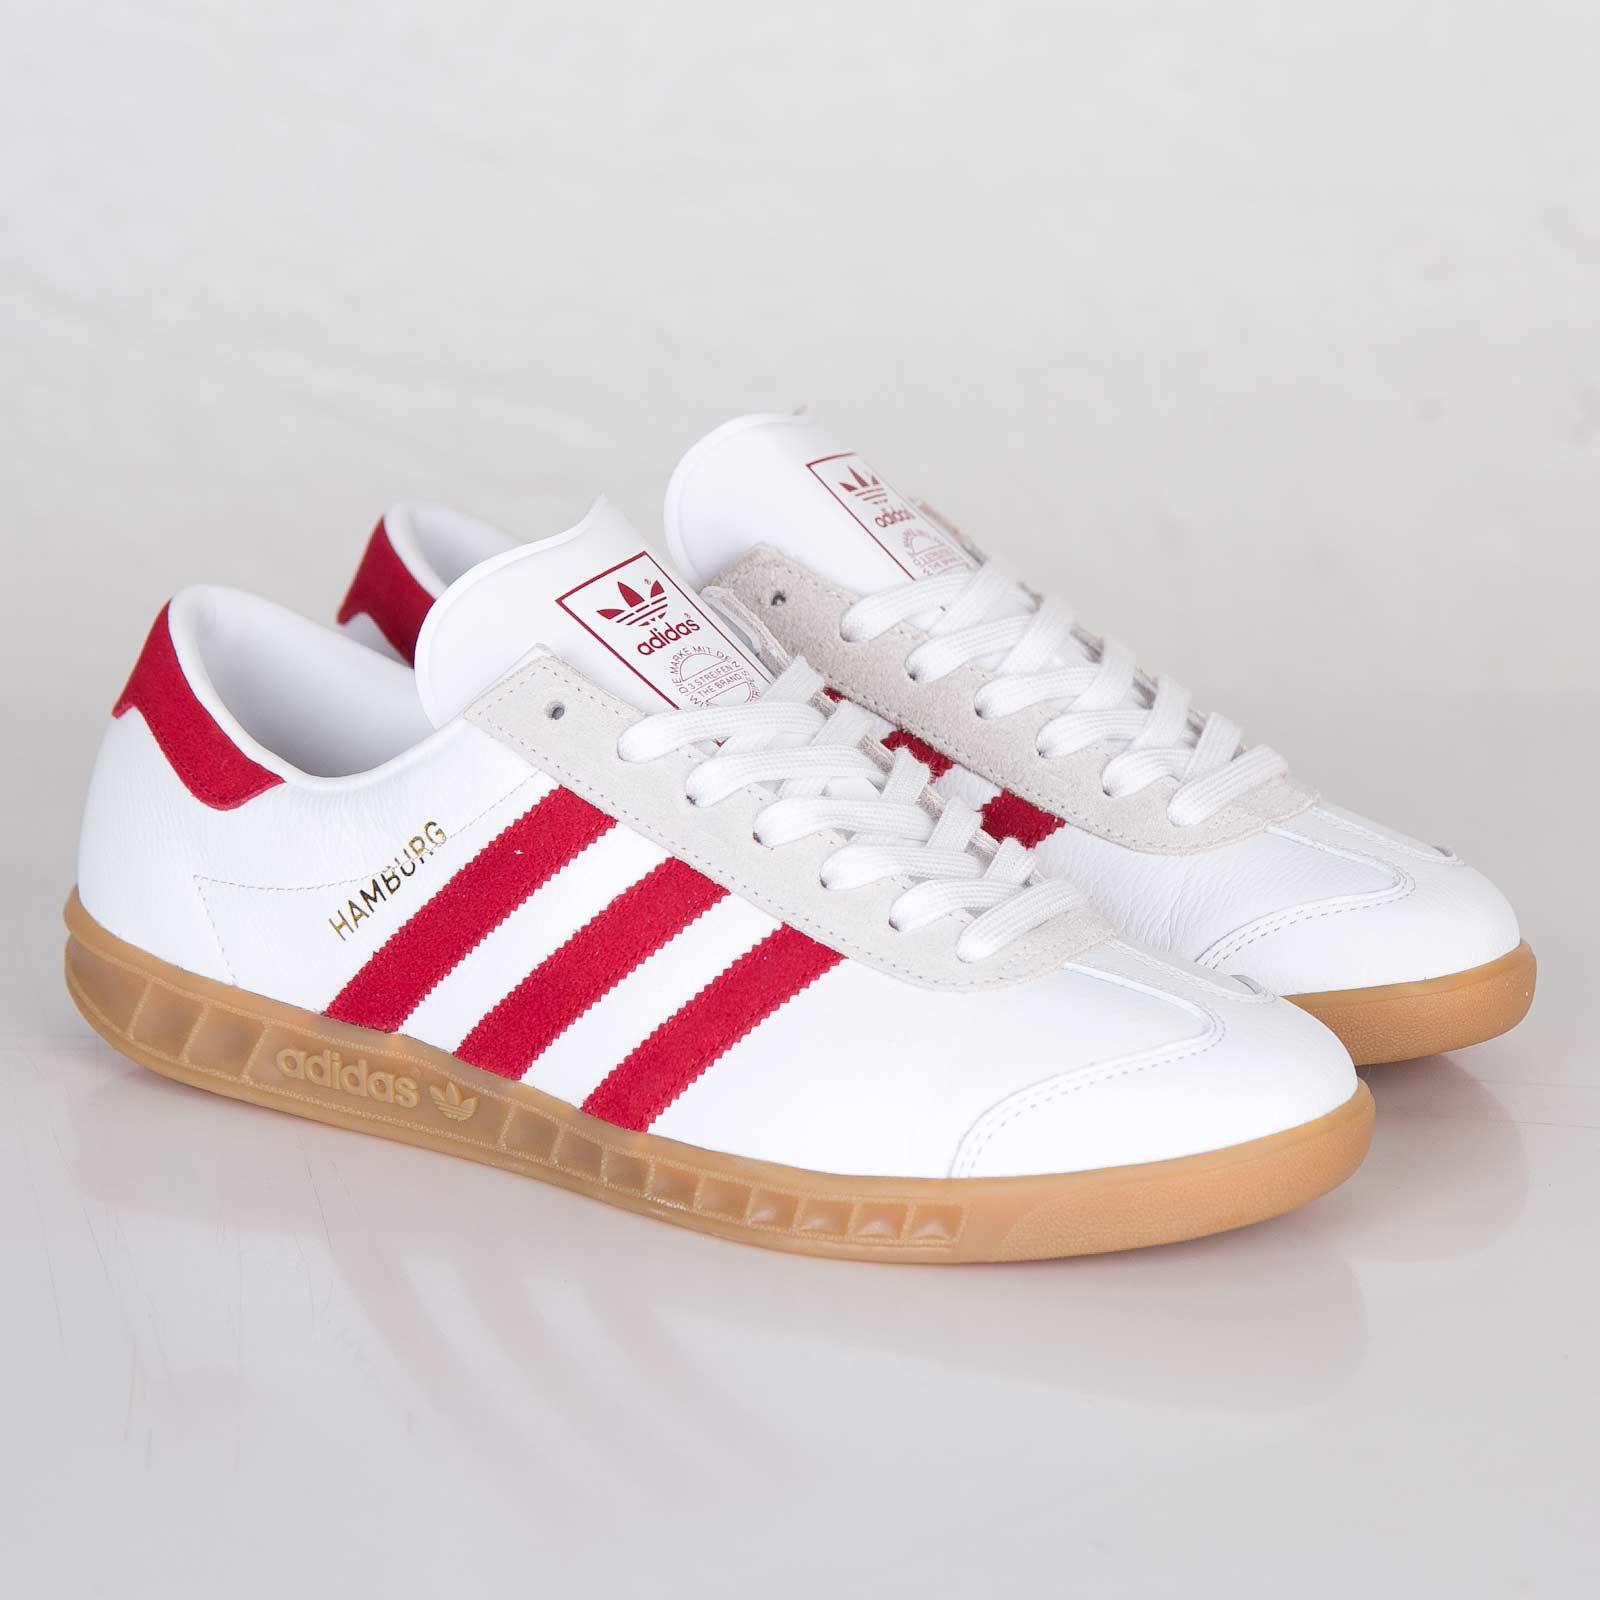 adidas Hamburg - M17309 - SNS | sneakers & streetwear online since ...